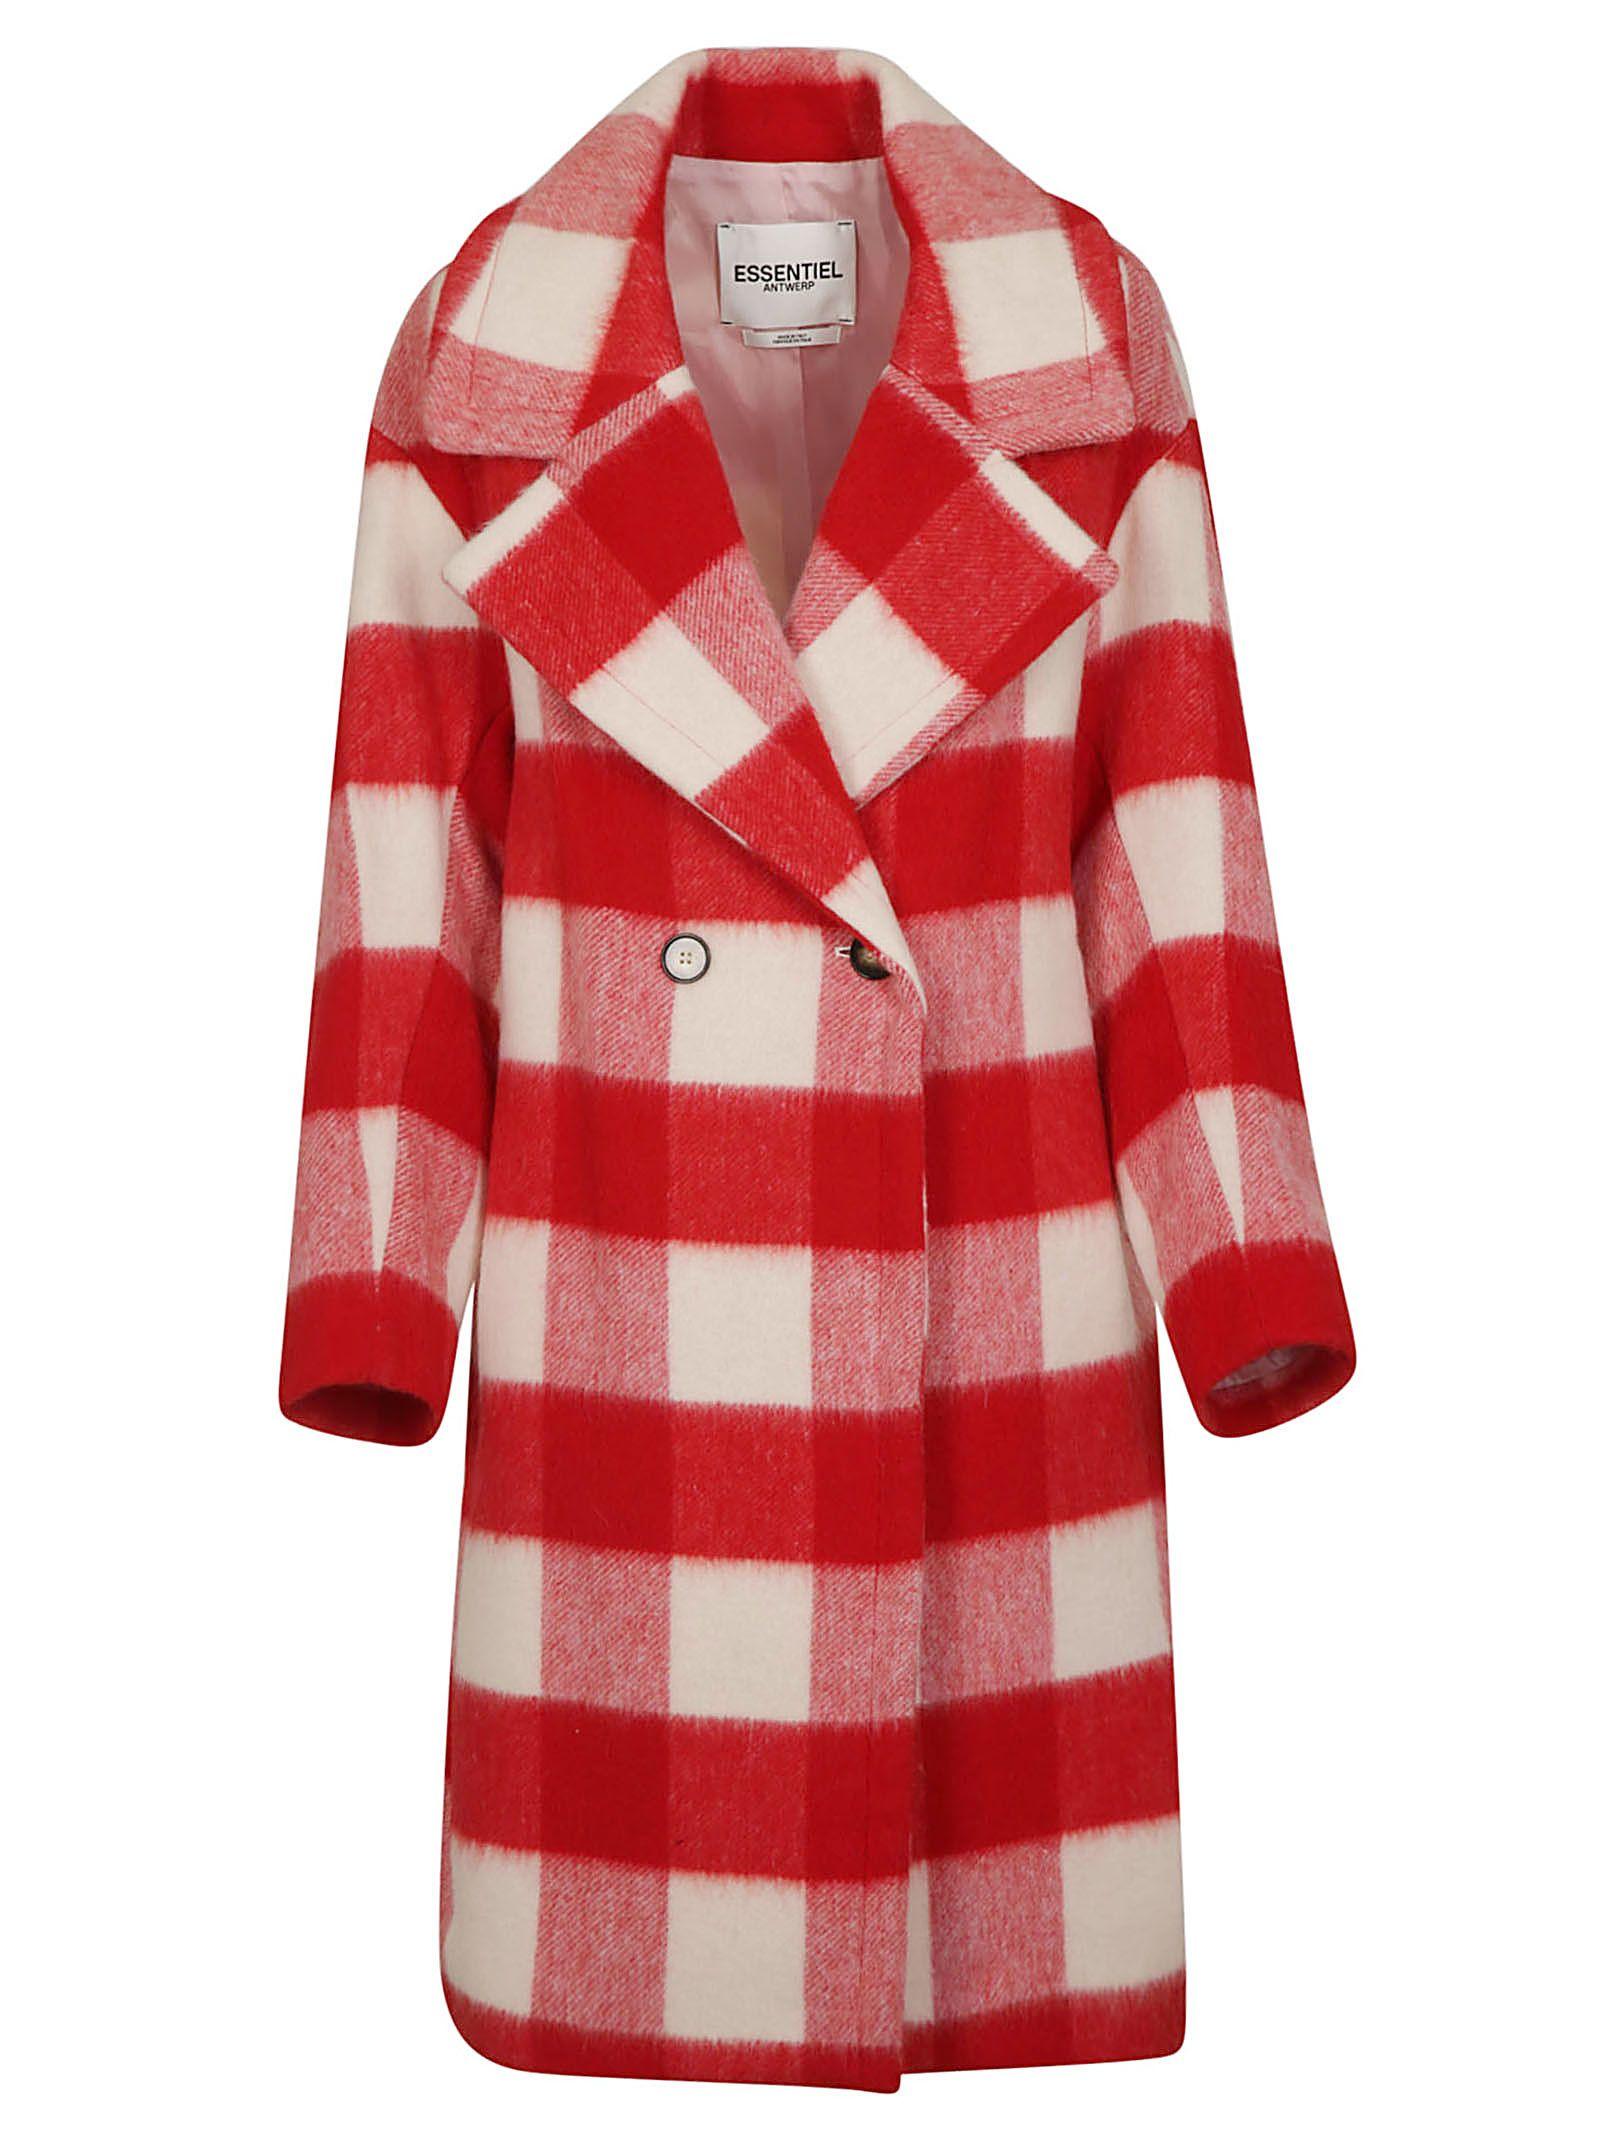 ESSENTIEL ANTWERP Rosso Checked Coat - Red